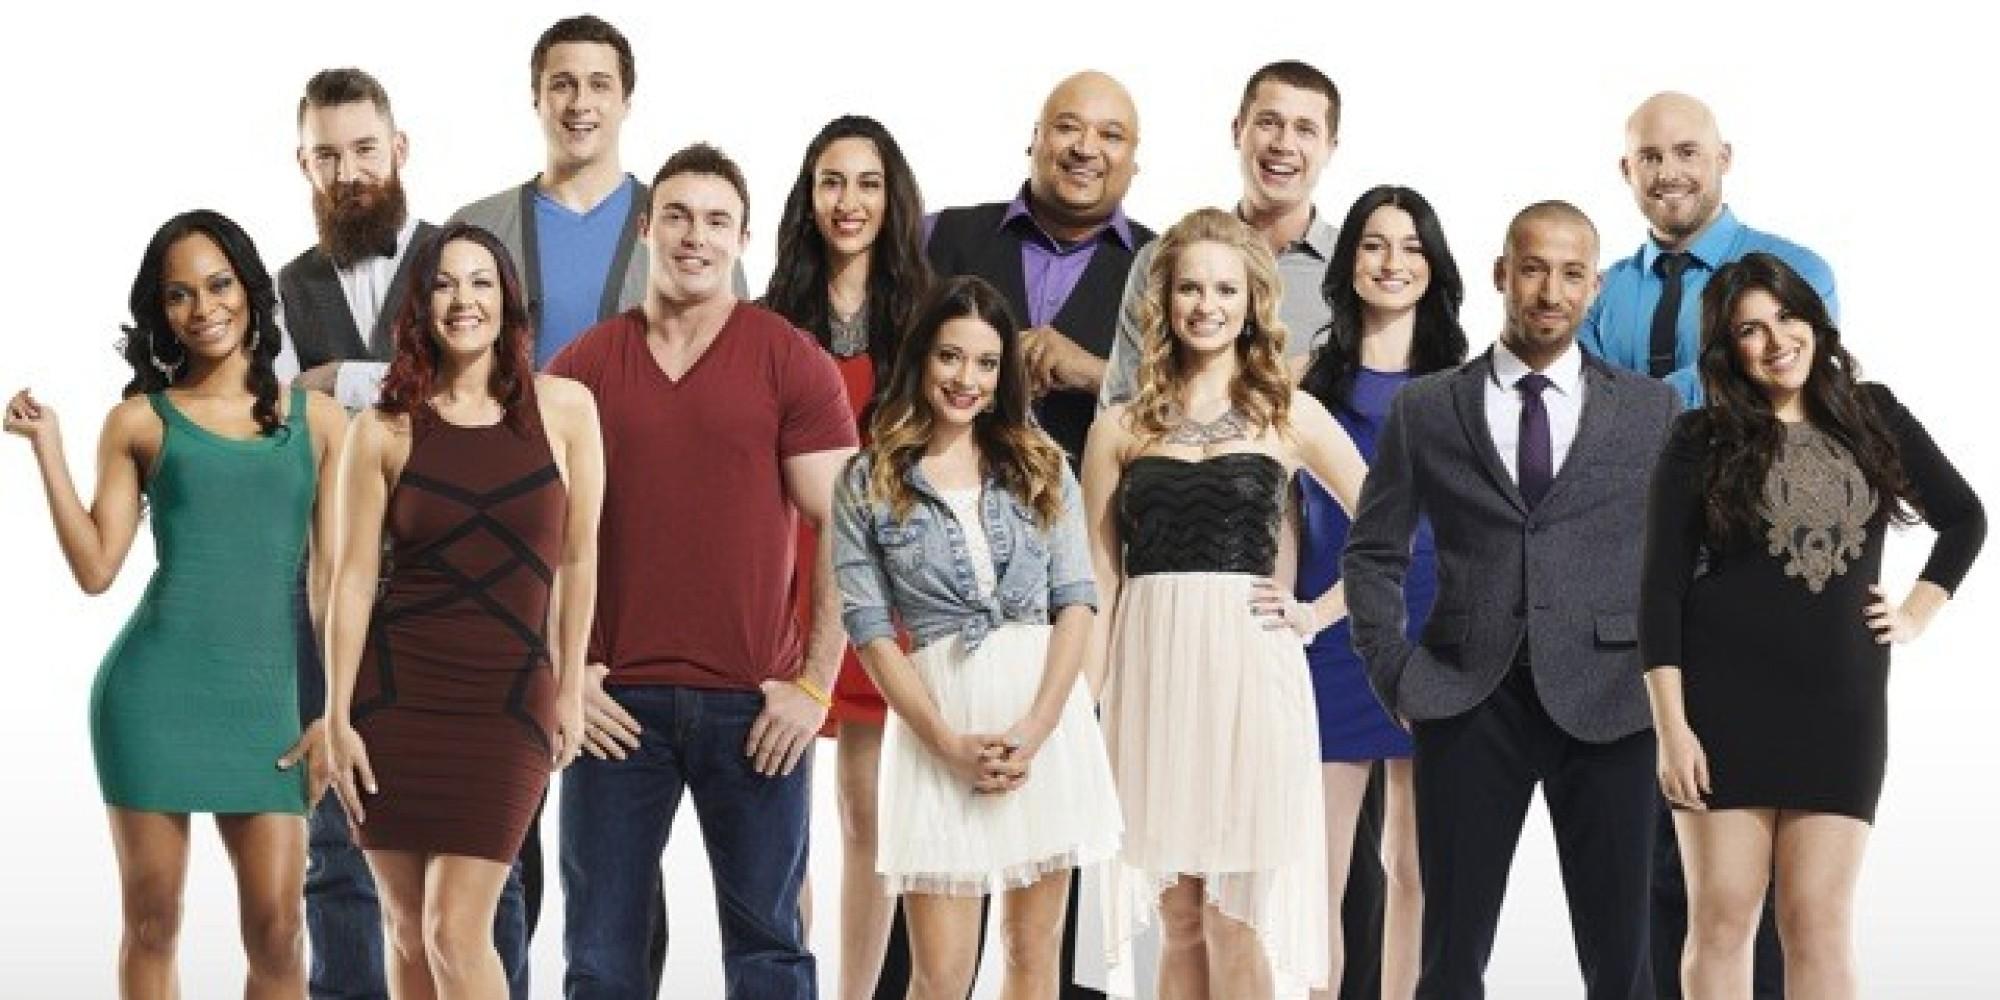 Big Brother Canada' Season 2 Cast: Meet The Contestants